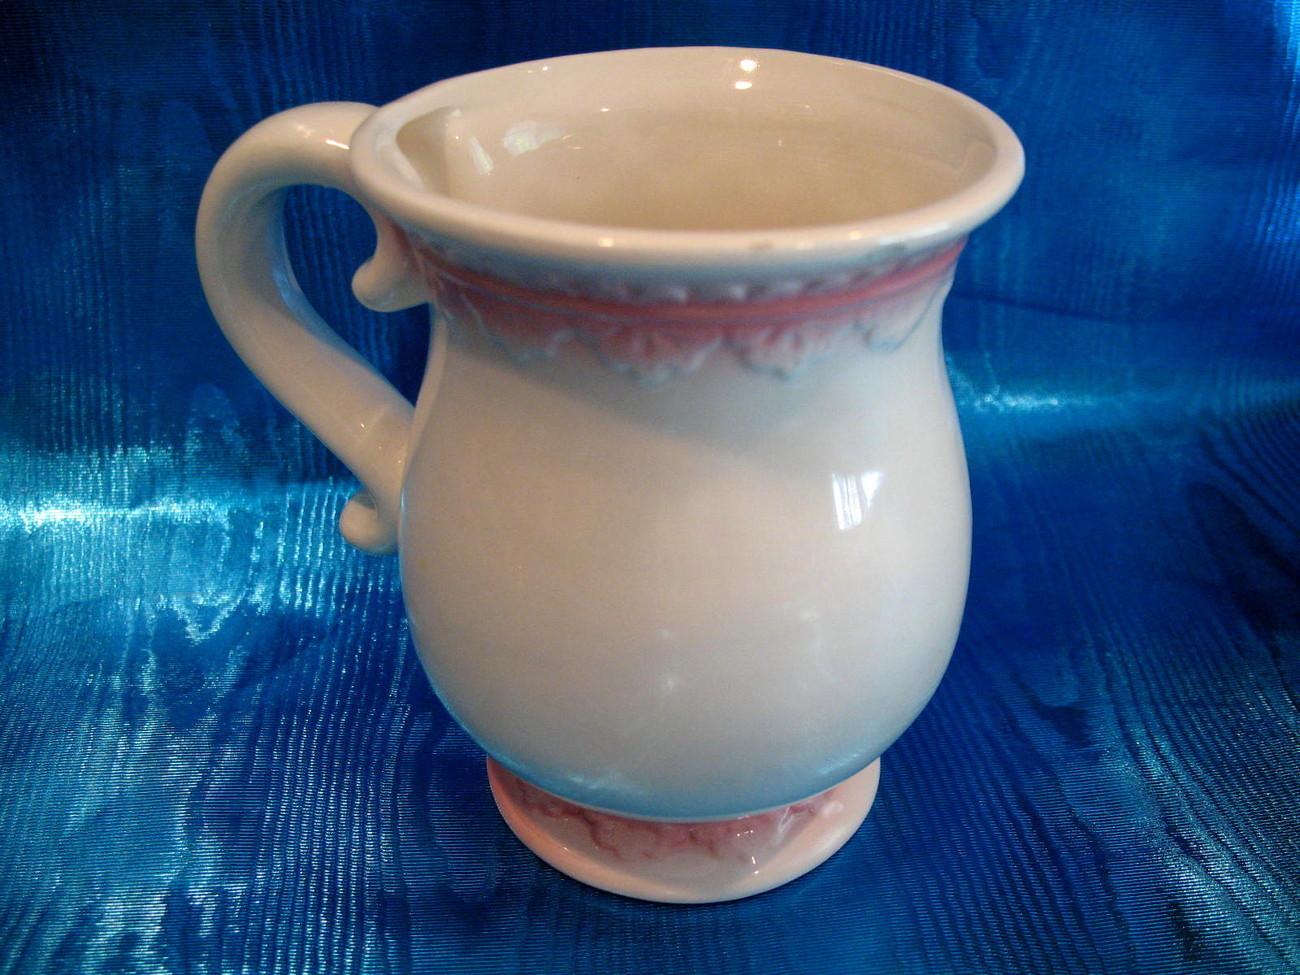 Childrens PIXIE GIRL Cup Mug RELPO Souvenir Collector Collectible Milk Cup